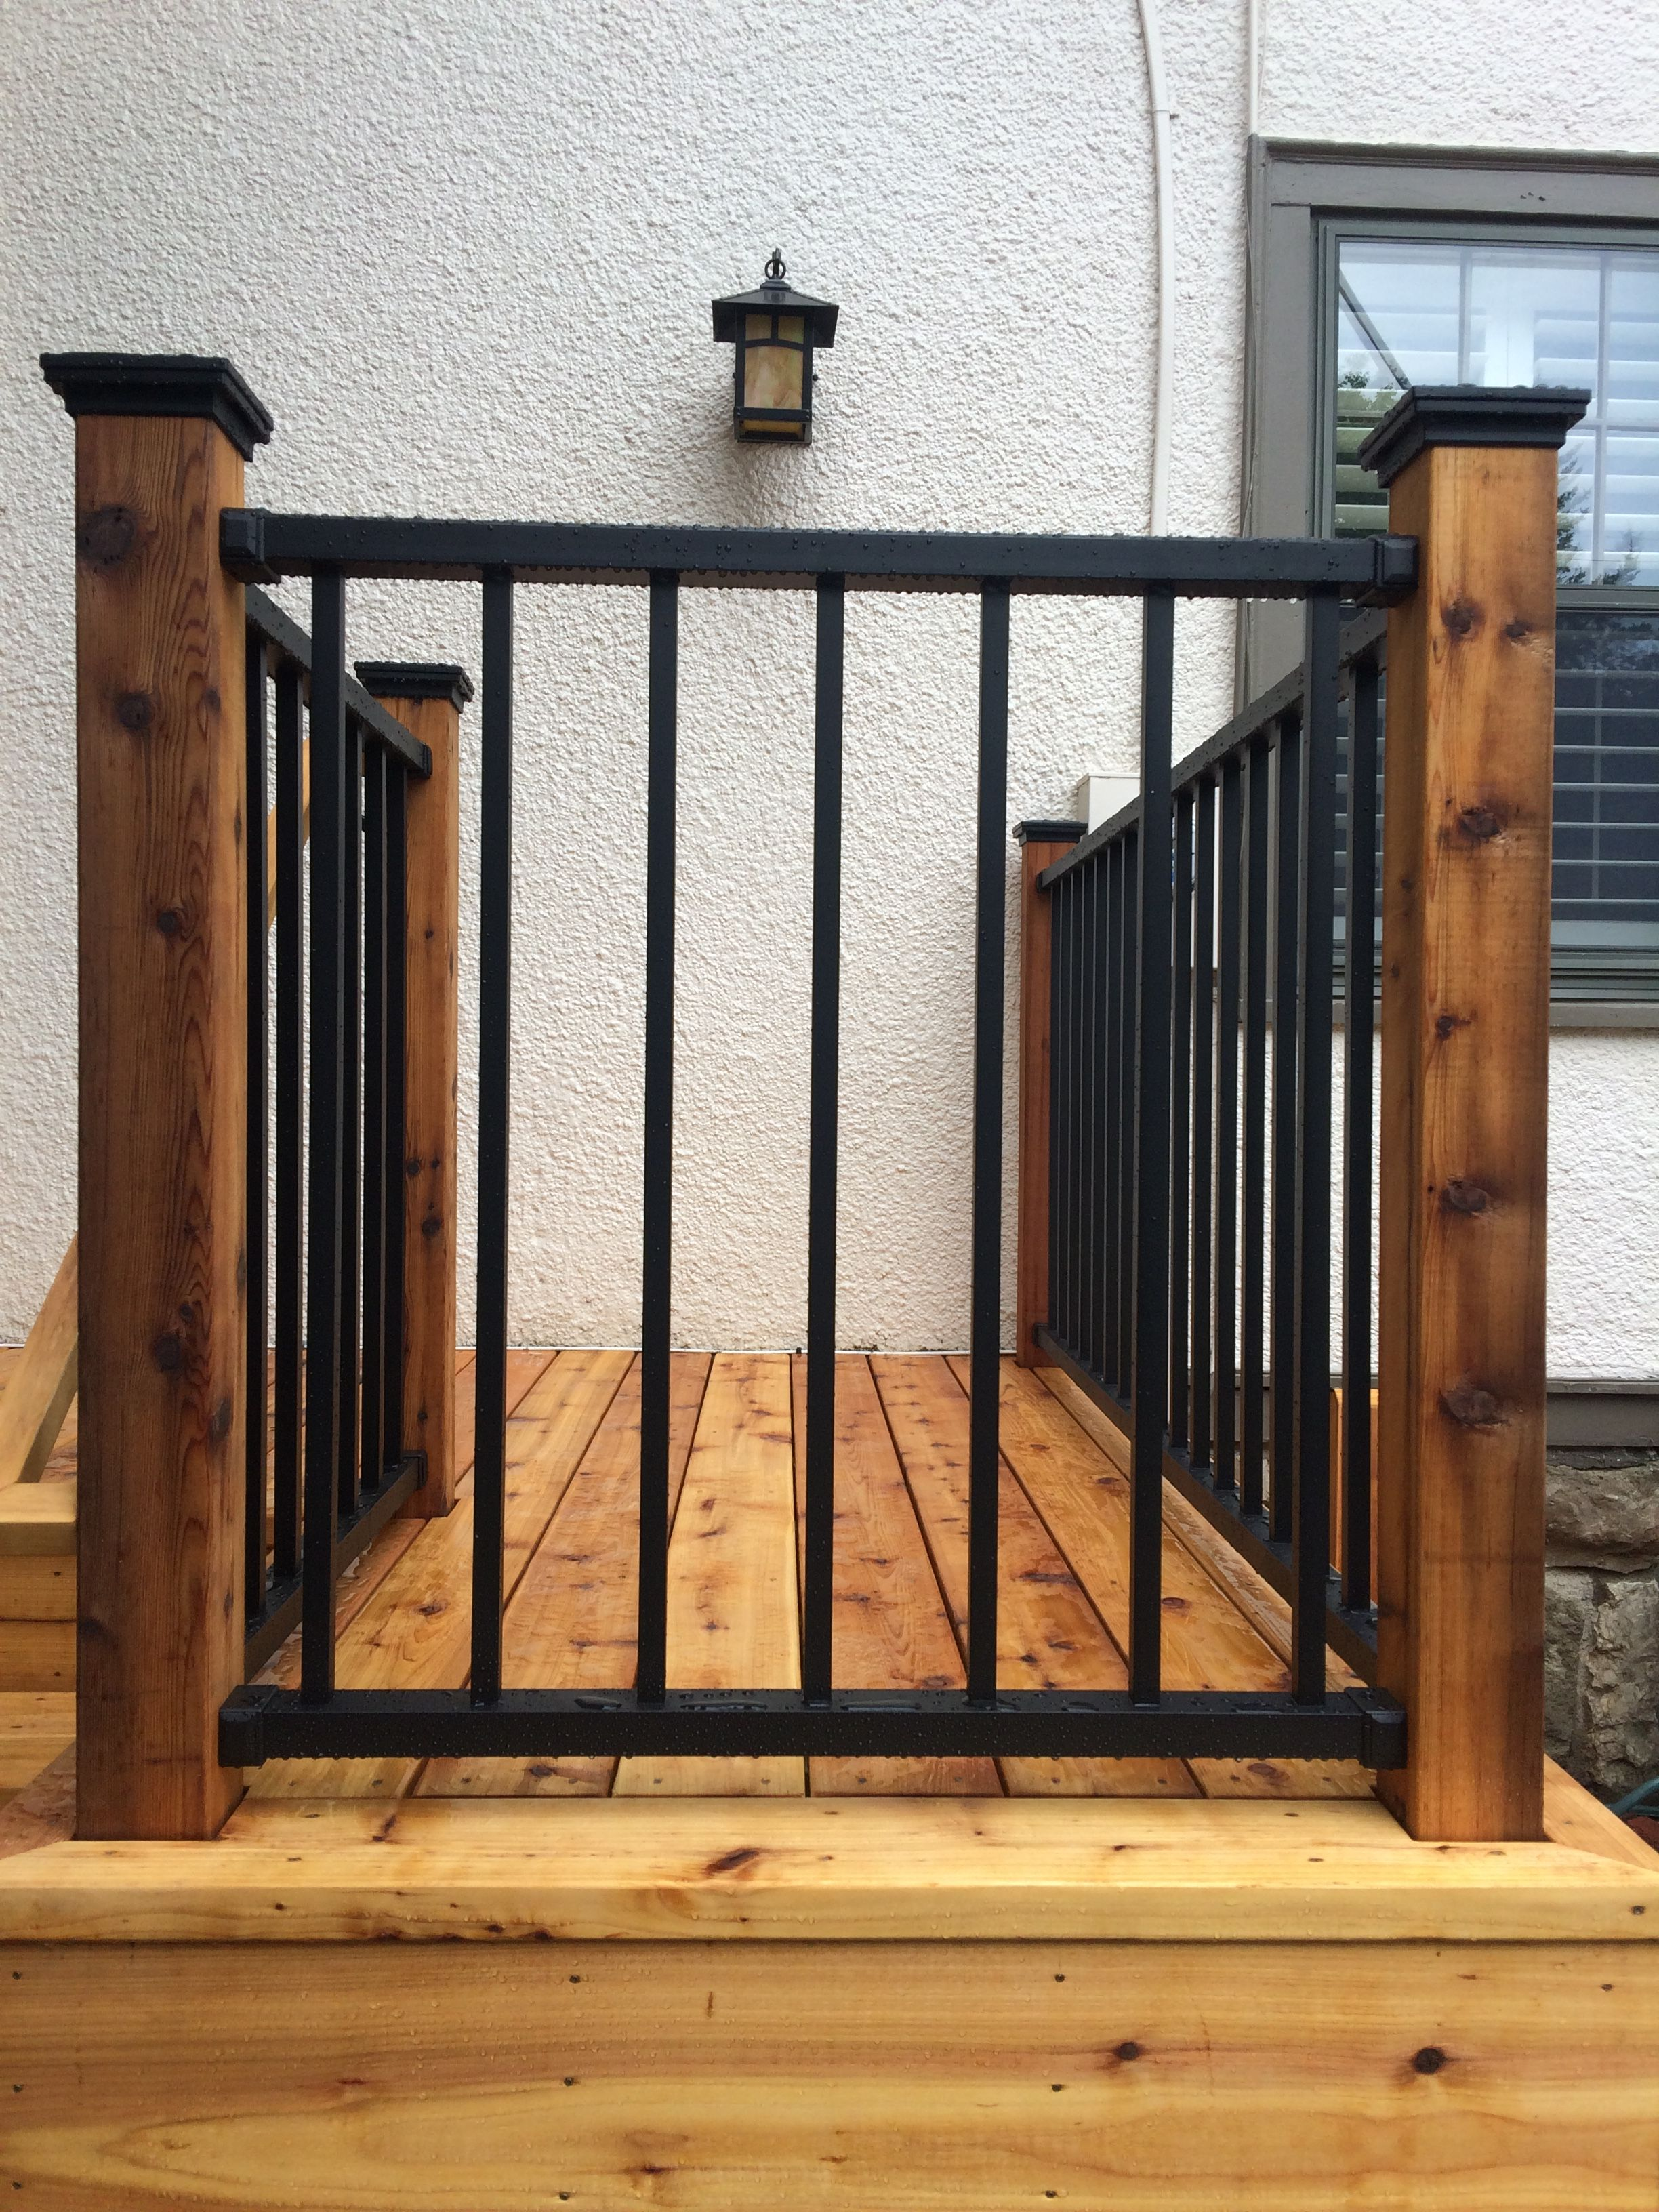 outdoor railing designs on westbury aluminum railing black attached to cedar posts outdoor stair railing porch handrails porch stairs westbury aluminum railing black